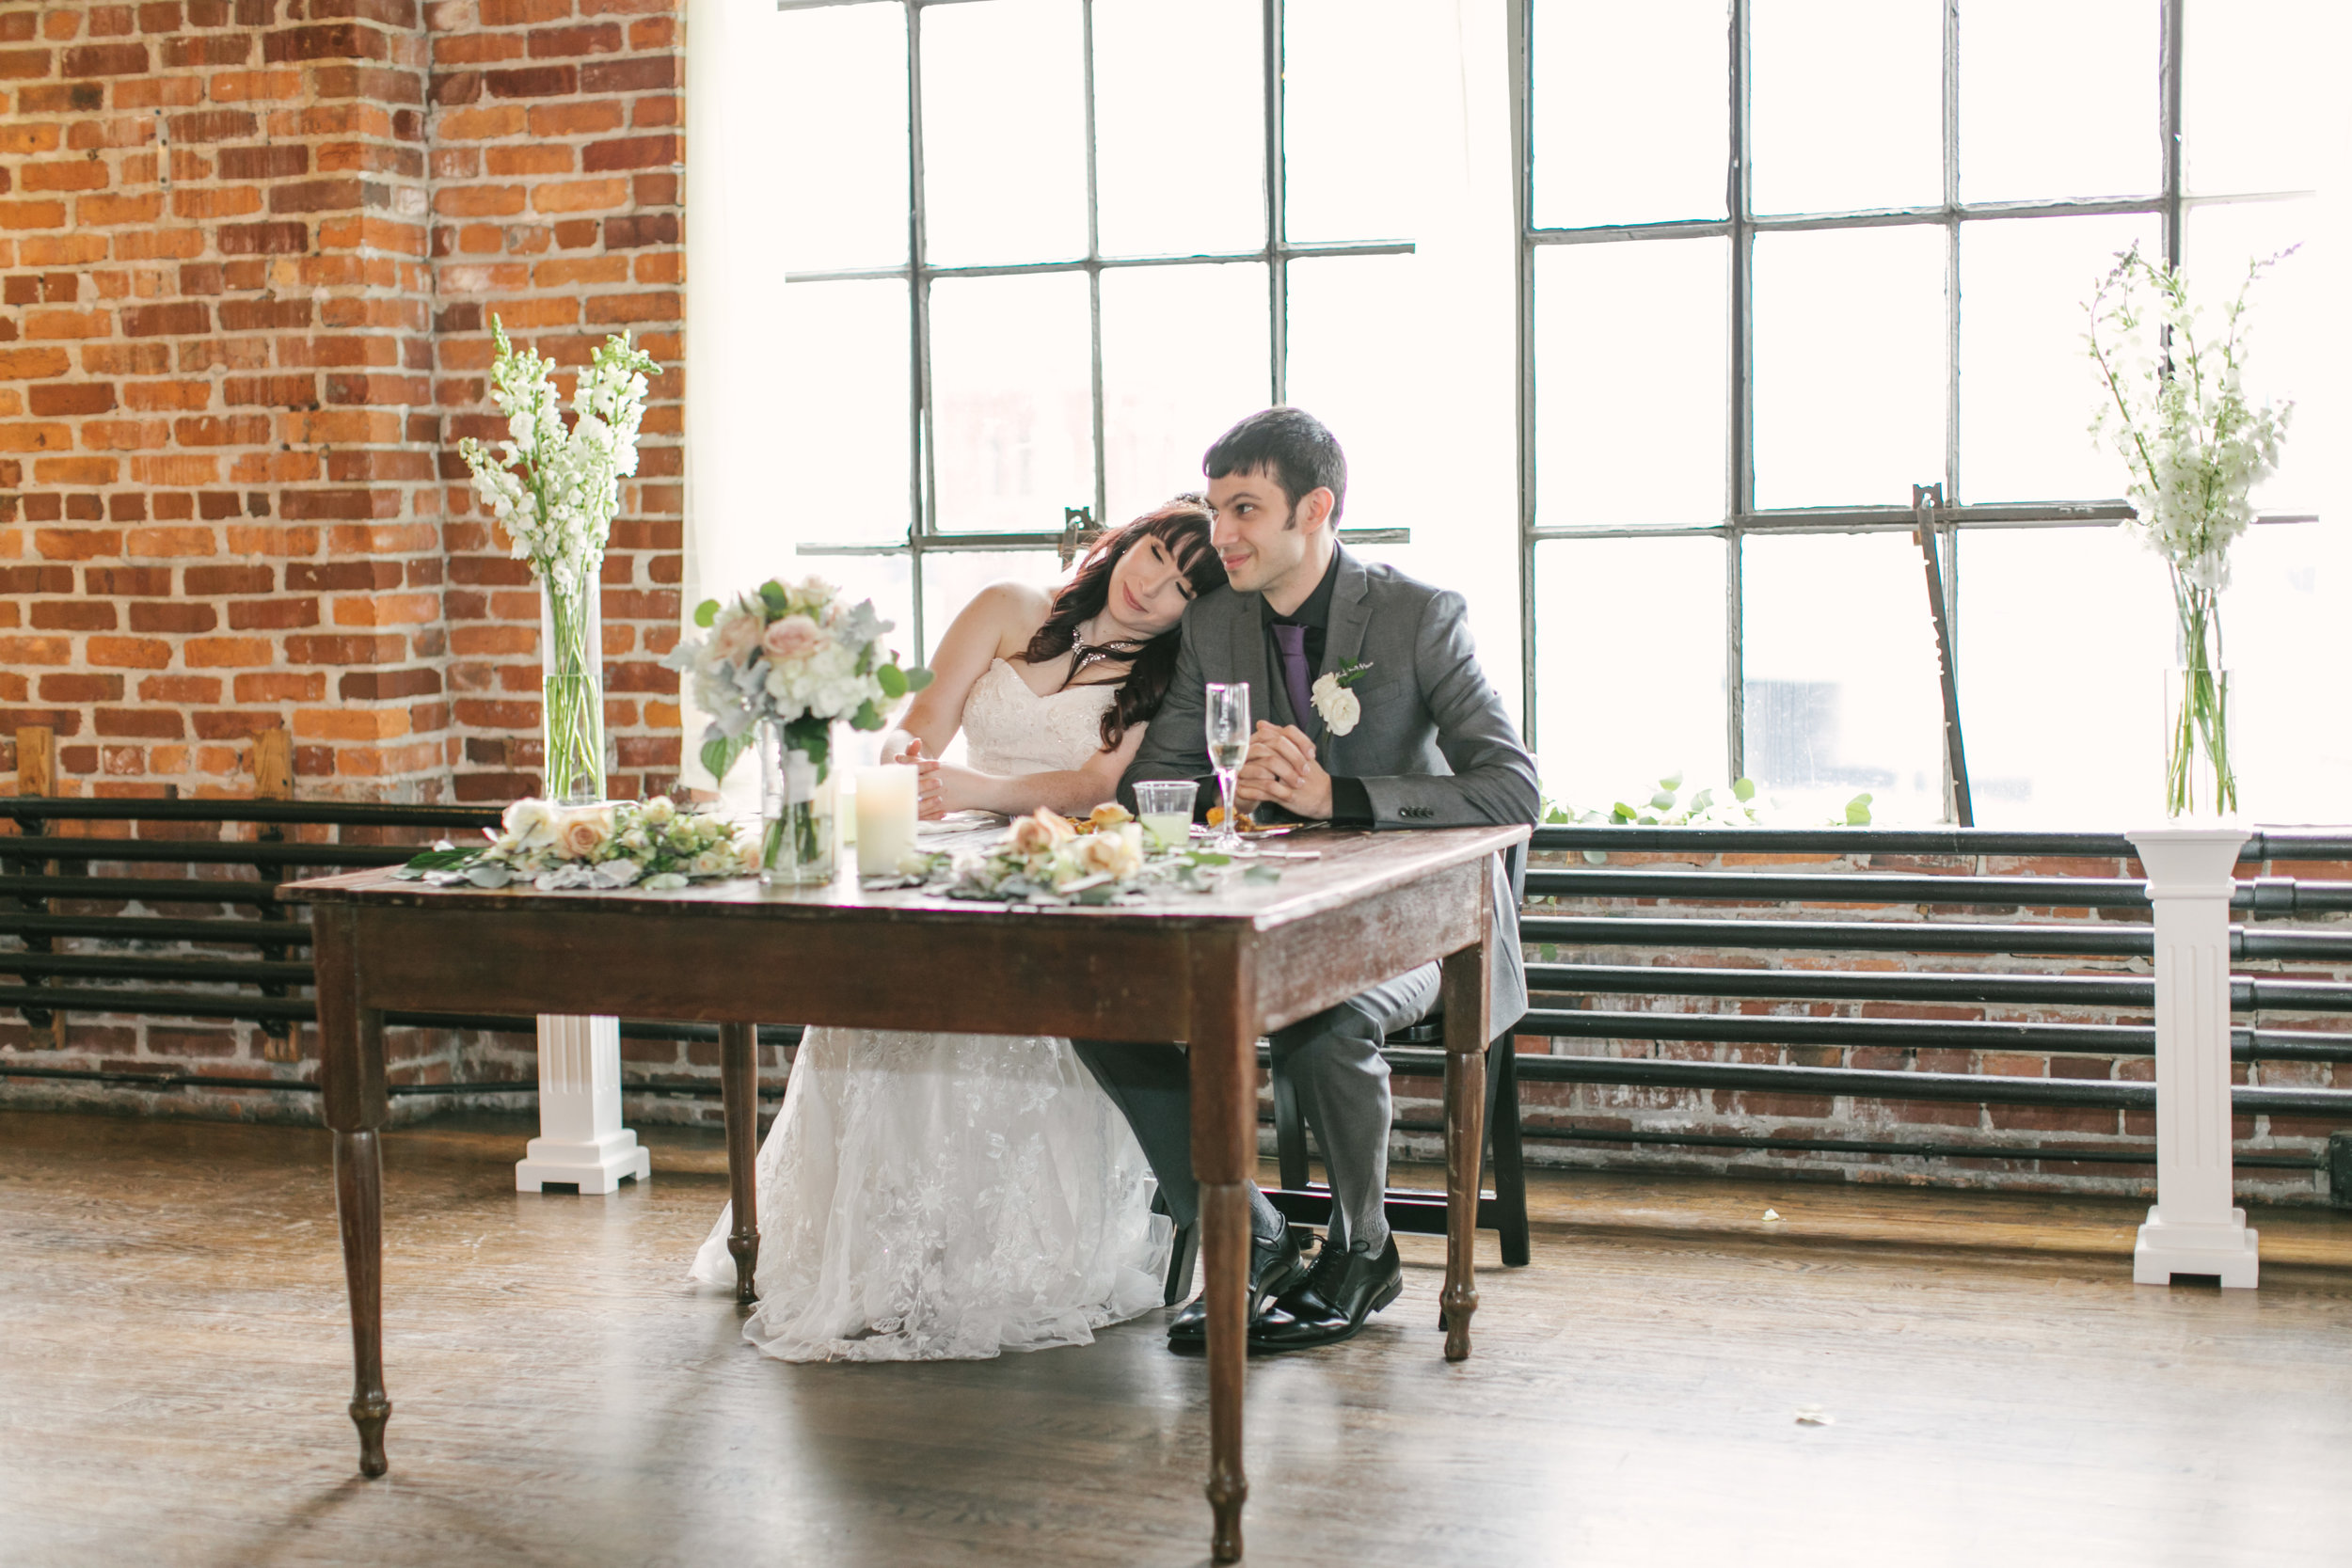 786_Colin+Jessica_Wedding.jpg